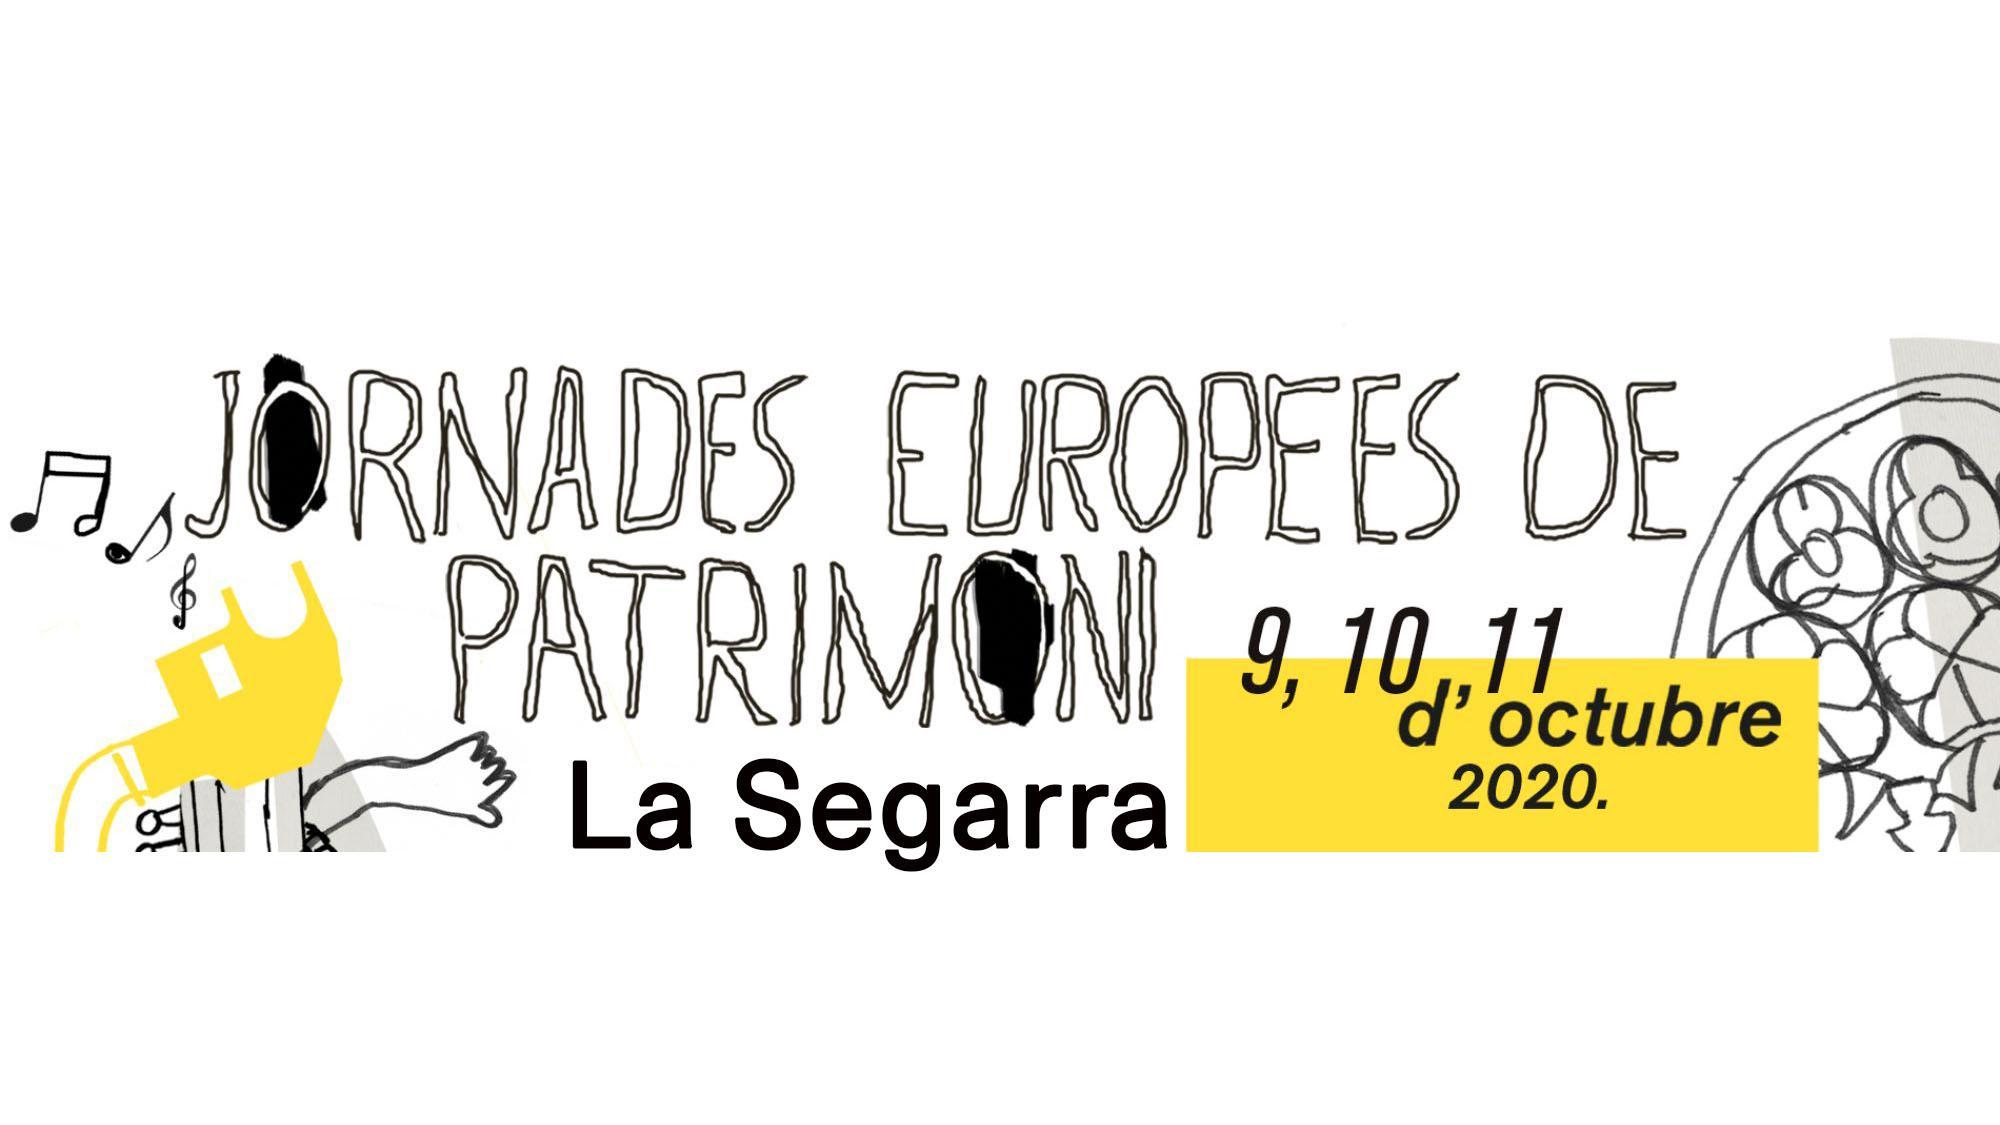 Jornades Europees del Patrimoni 2020